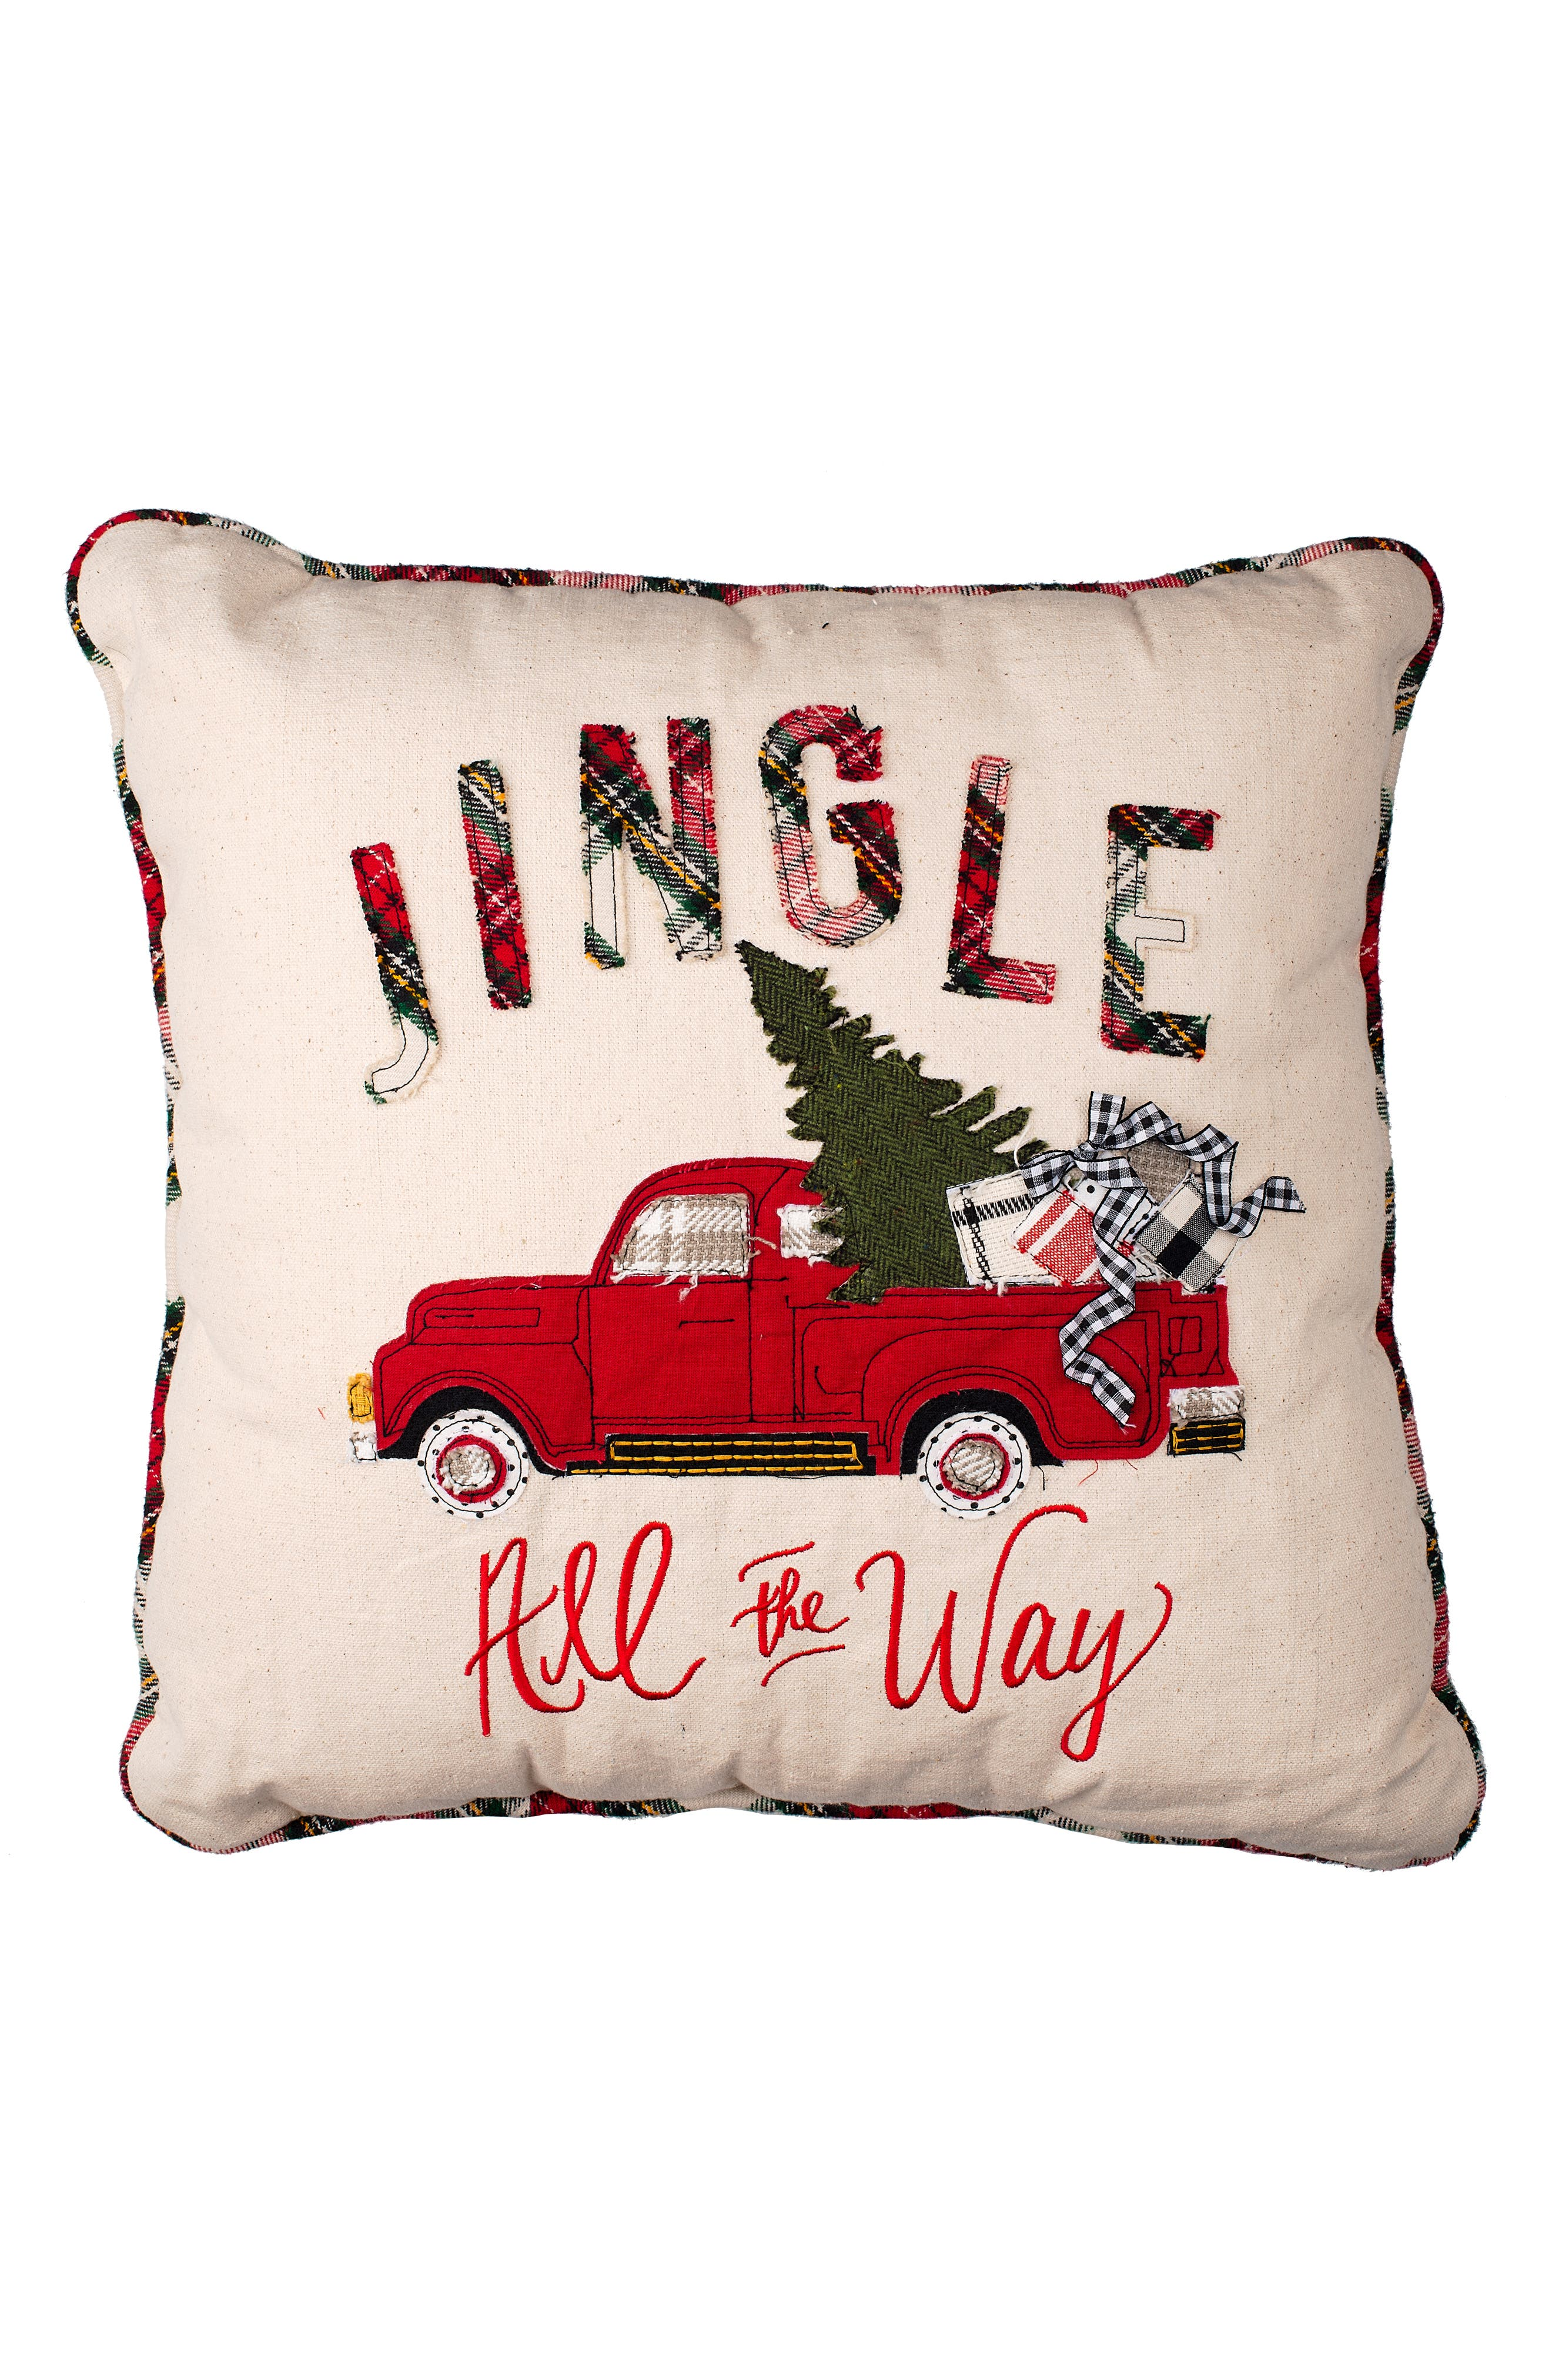 GLORY HAUS Jingle All the Way Pillow, Main, color, 100